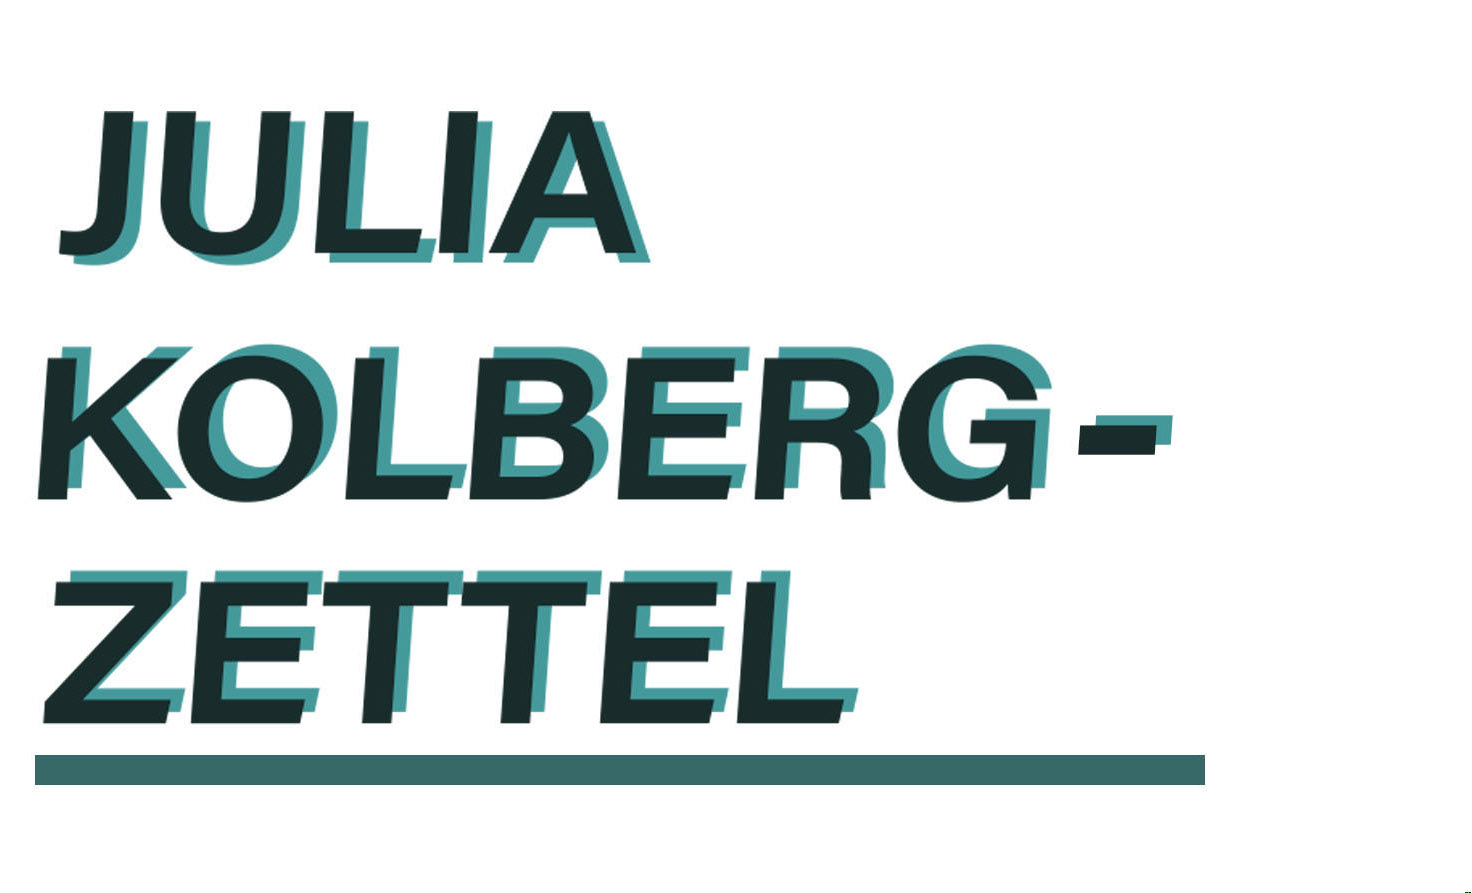 Julia Kolberg-Zettel